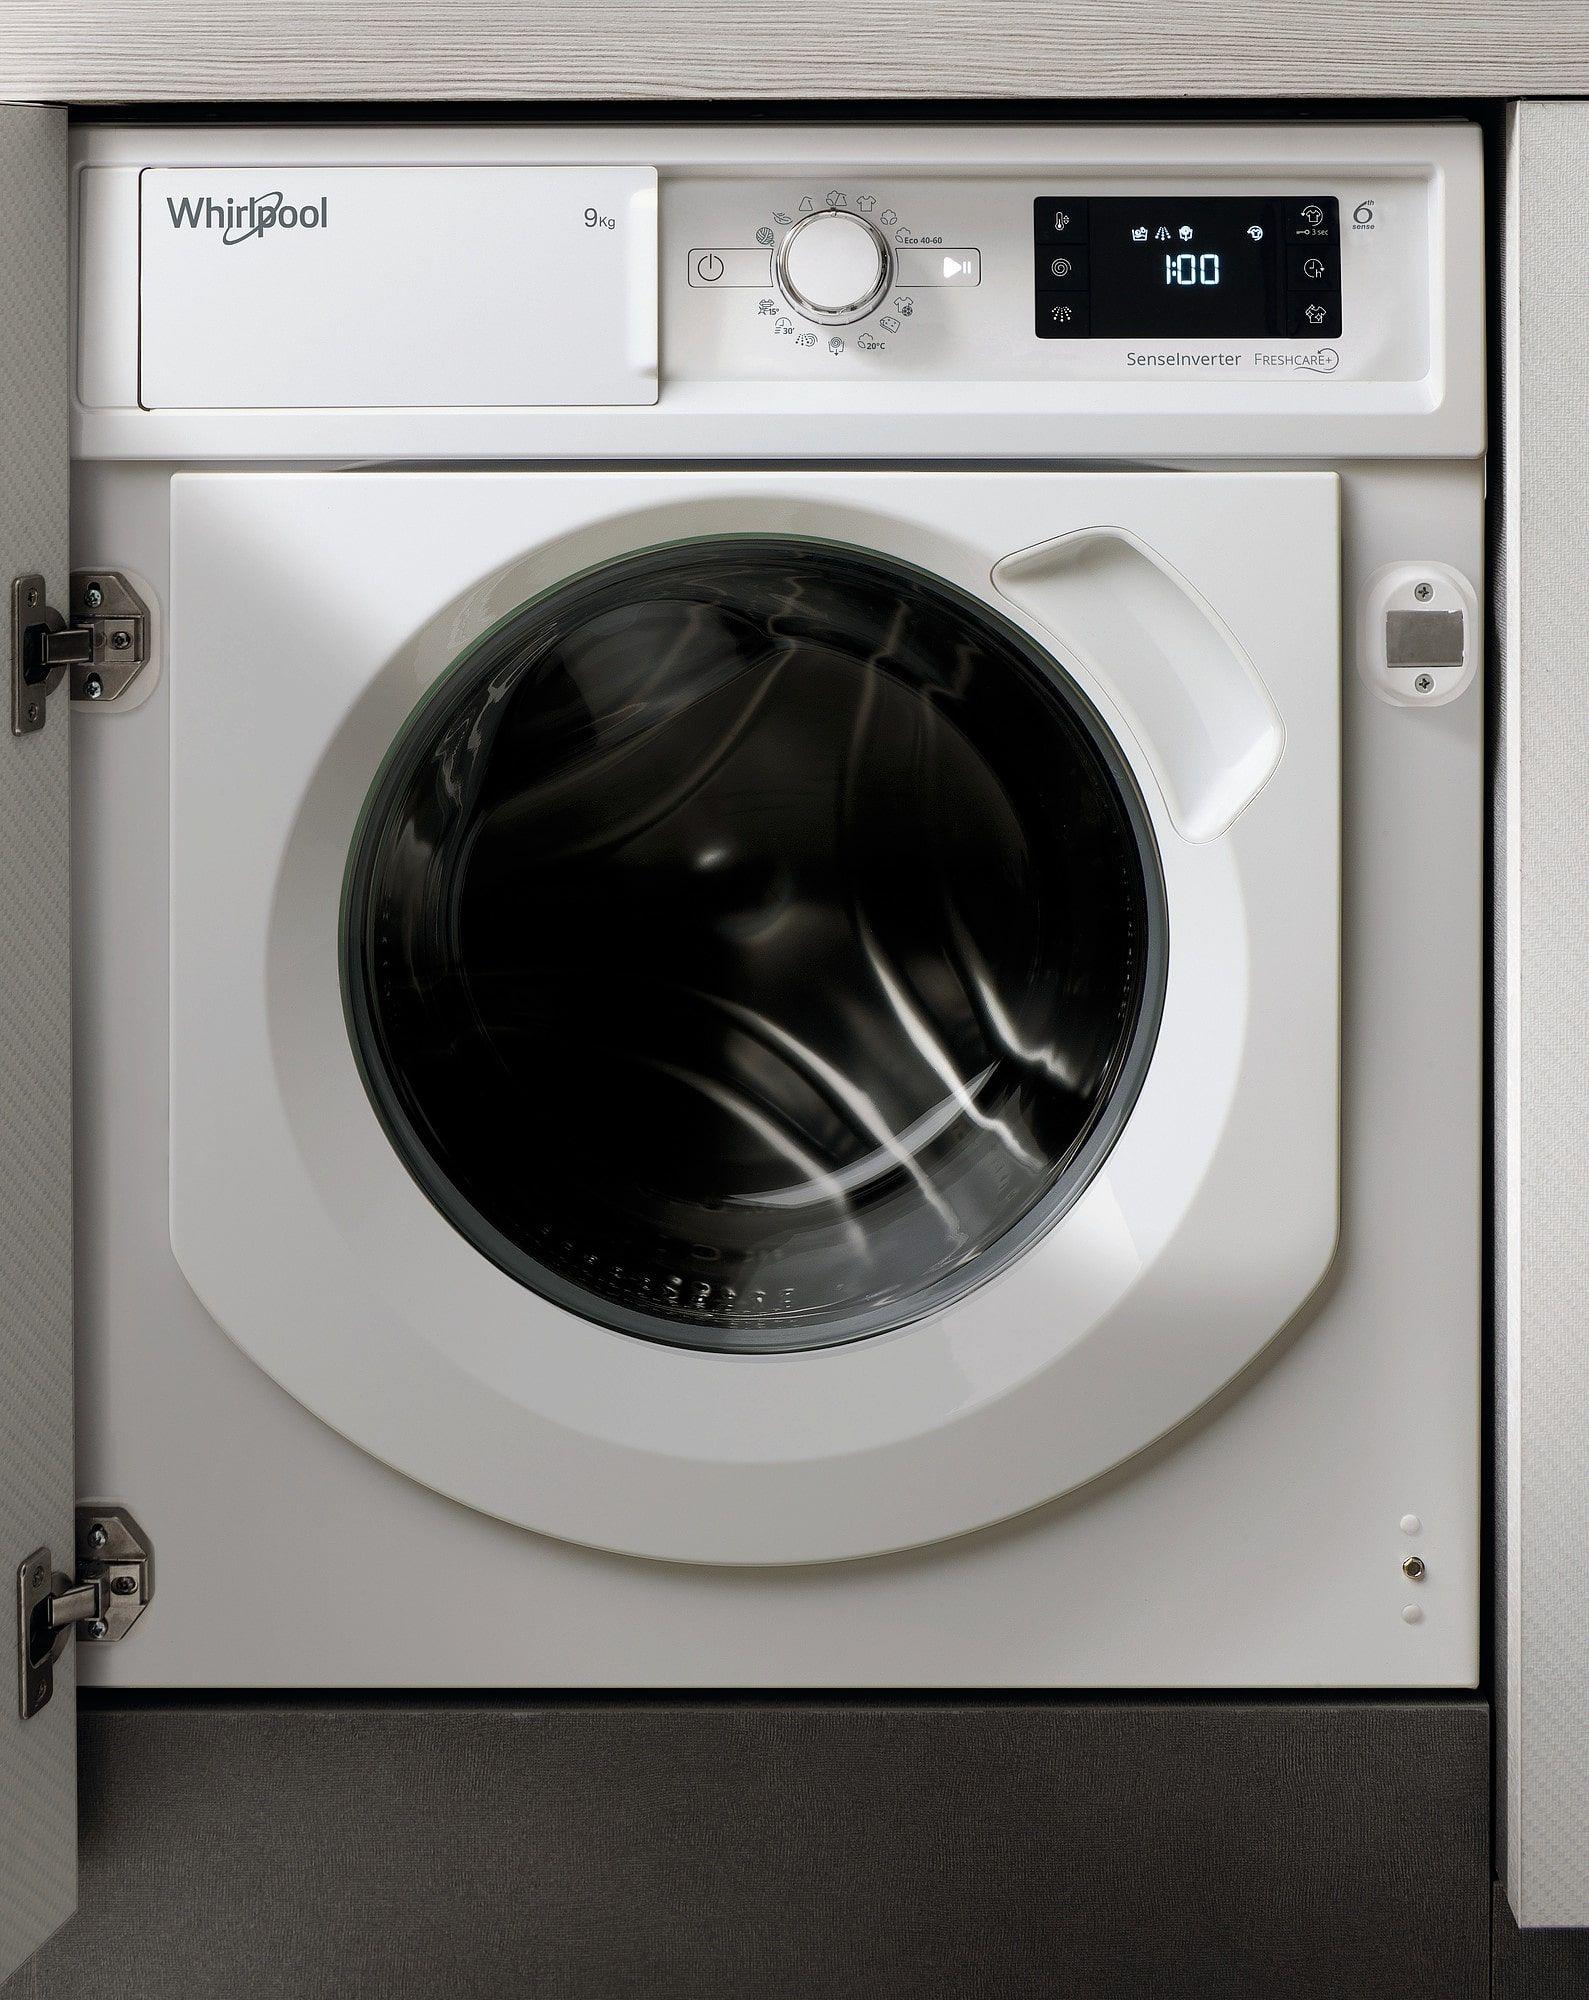 Pralka do zabudowy Whirlpool BI WMWG 91484E EU BI WMWG 91484E EU Iebūvējamā veļas mašīna